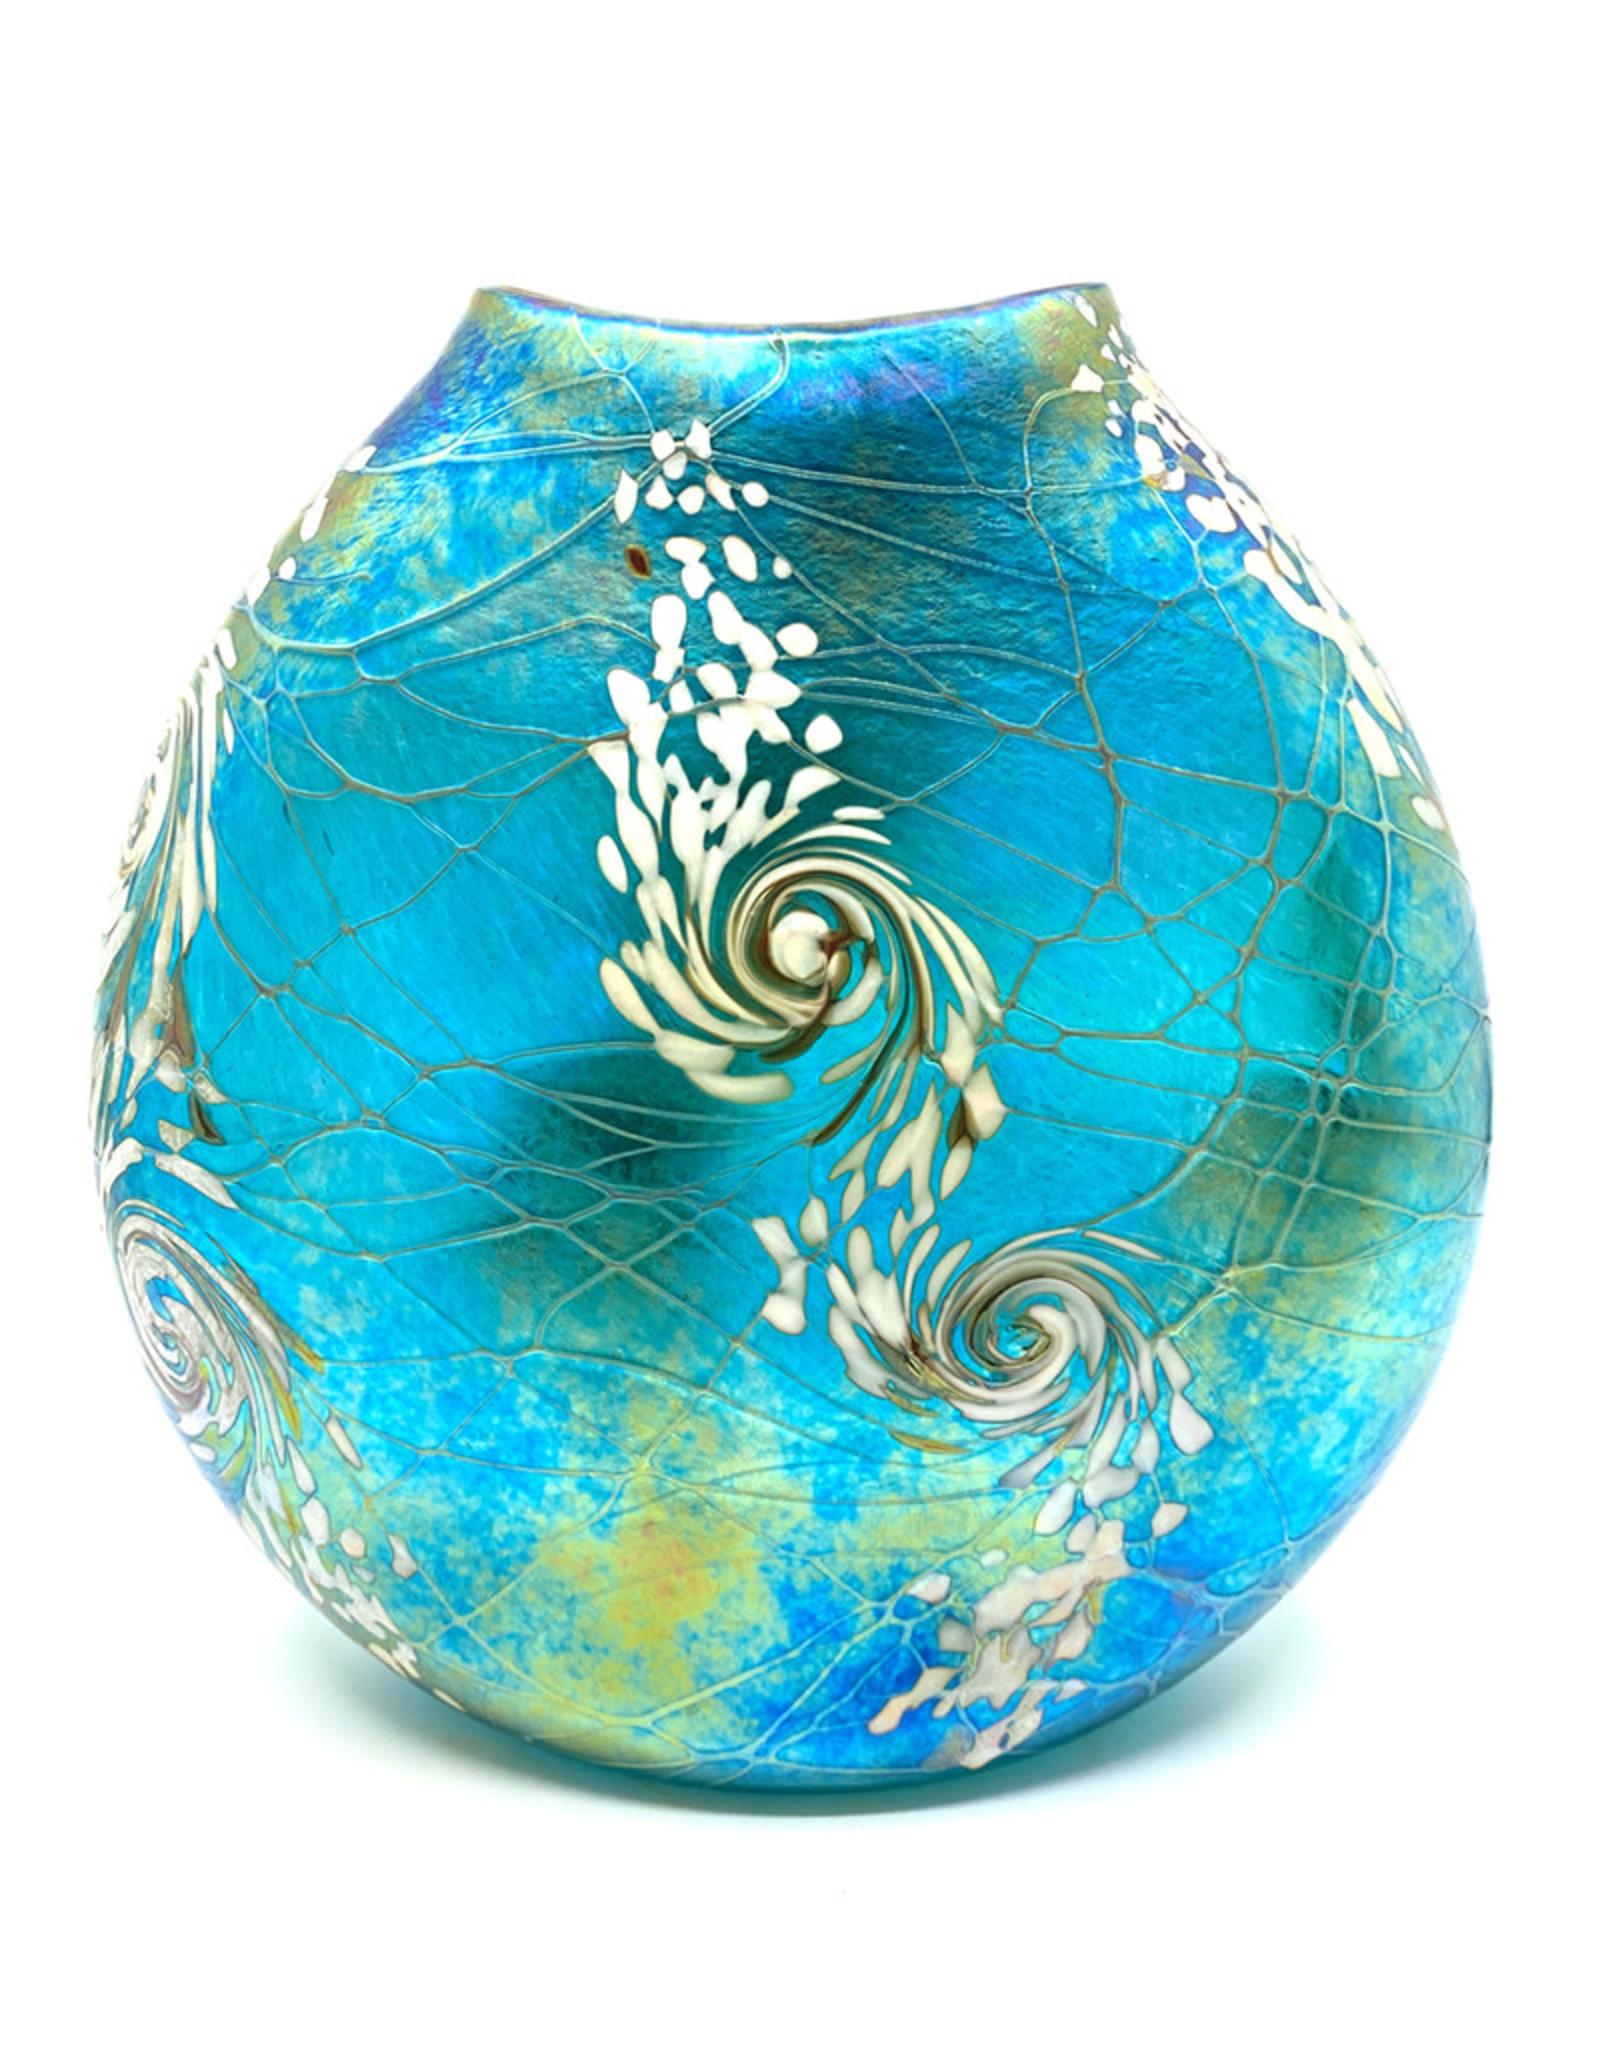 VINES ART GLASS FLAT TROPICAL SWIRL VASE